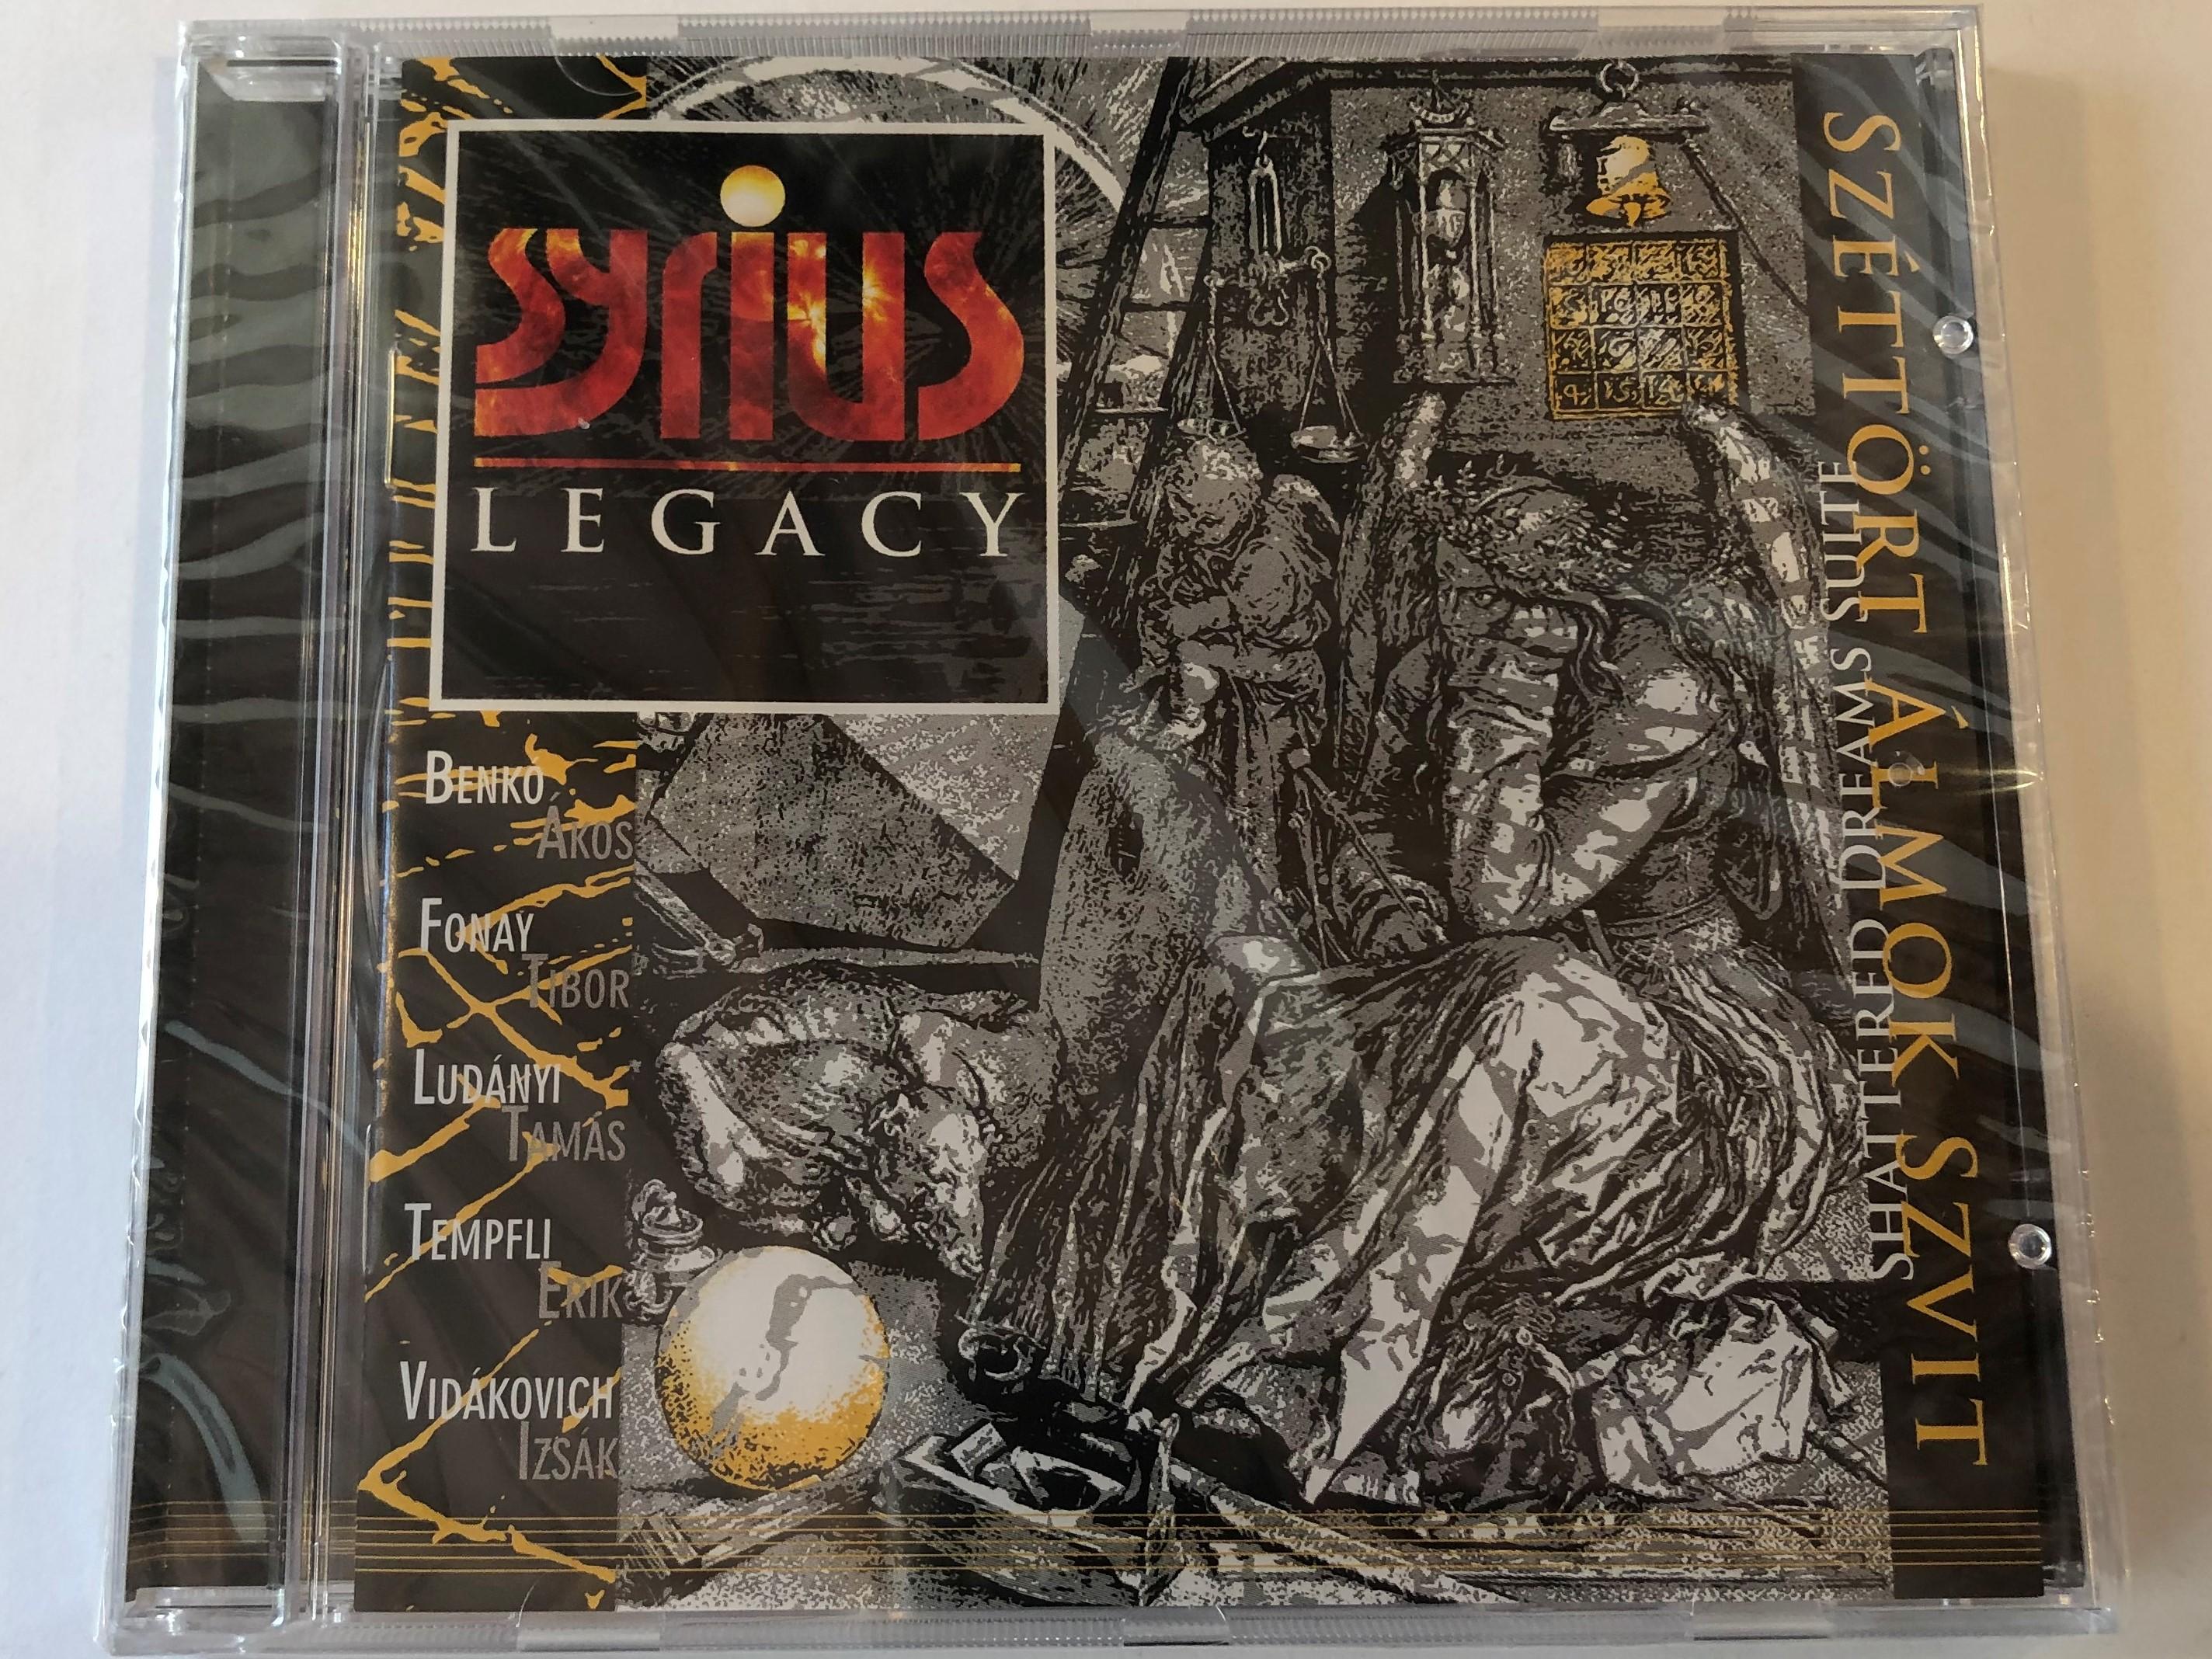 syrius-legacy-sz-tt-rt-lmok-szv-t-shattered-dreams-suite-tom-tom-studio-audio-cd-2017-ttcd267-1-.jpg